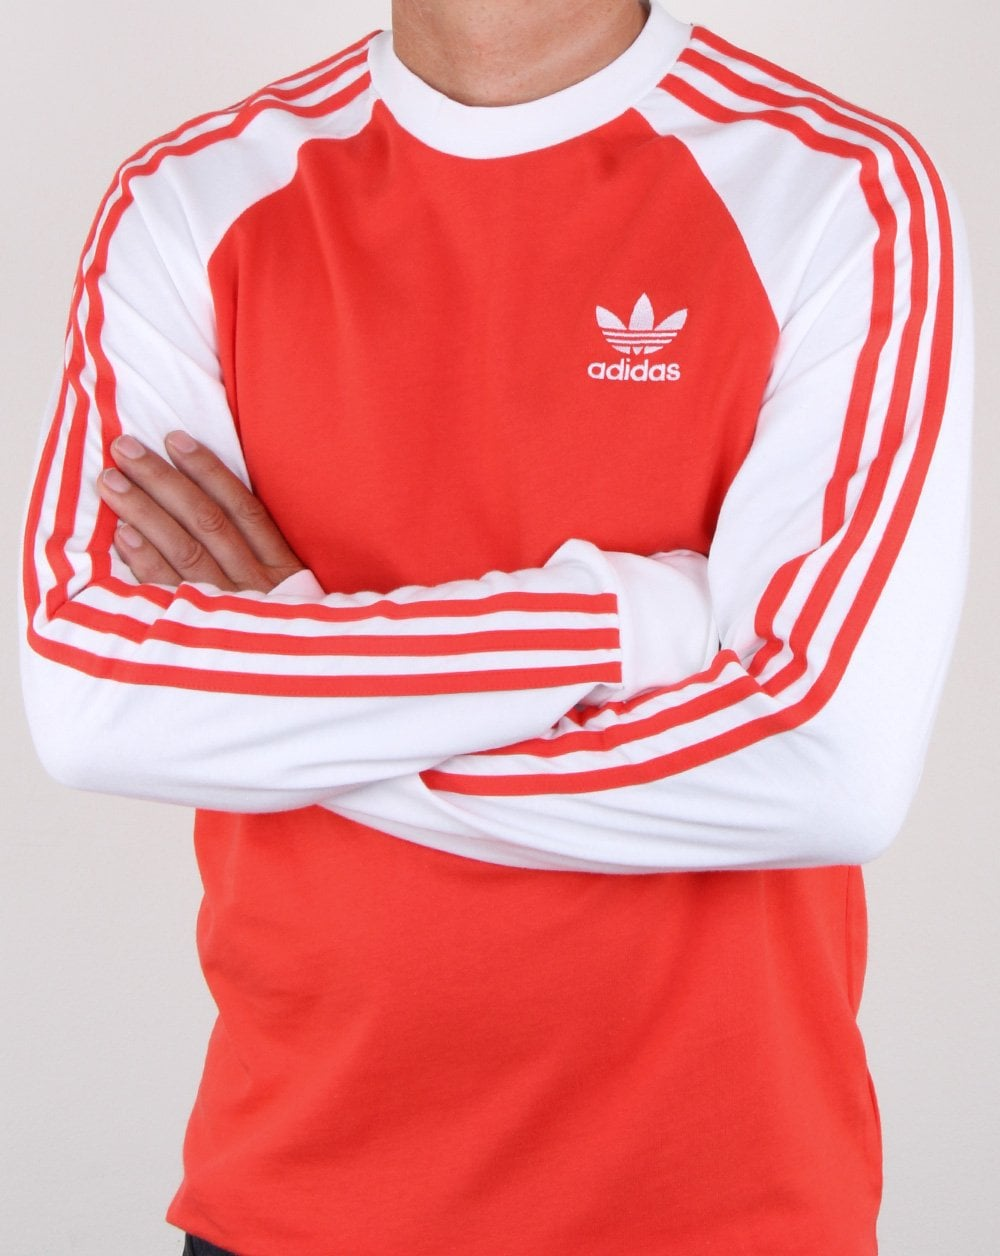 d22eec40 Adidas Originals 3 Stripes Long Sleeve T Shirt Bright Red